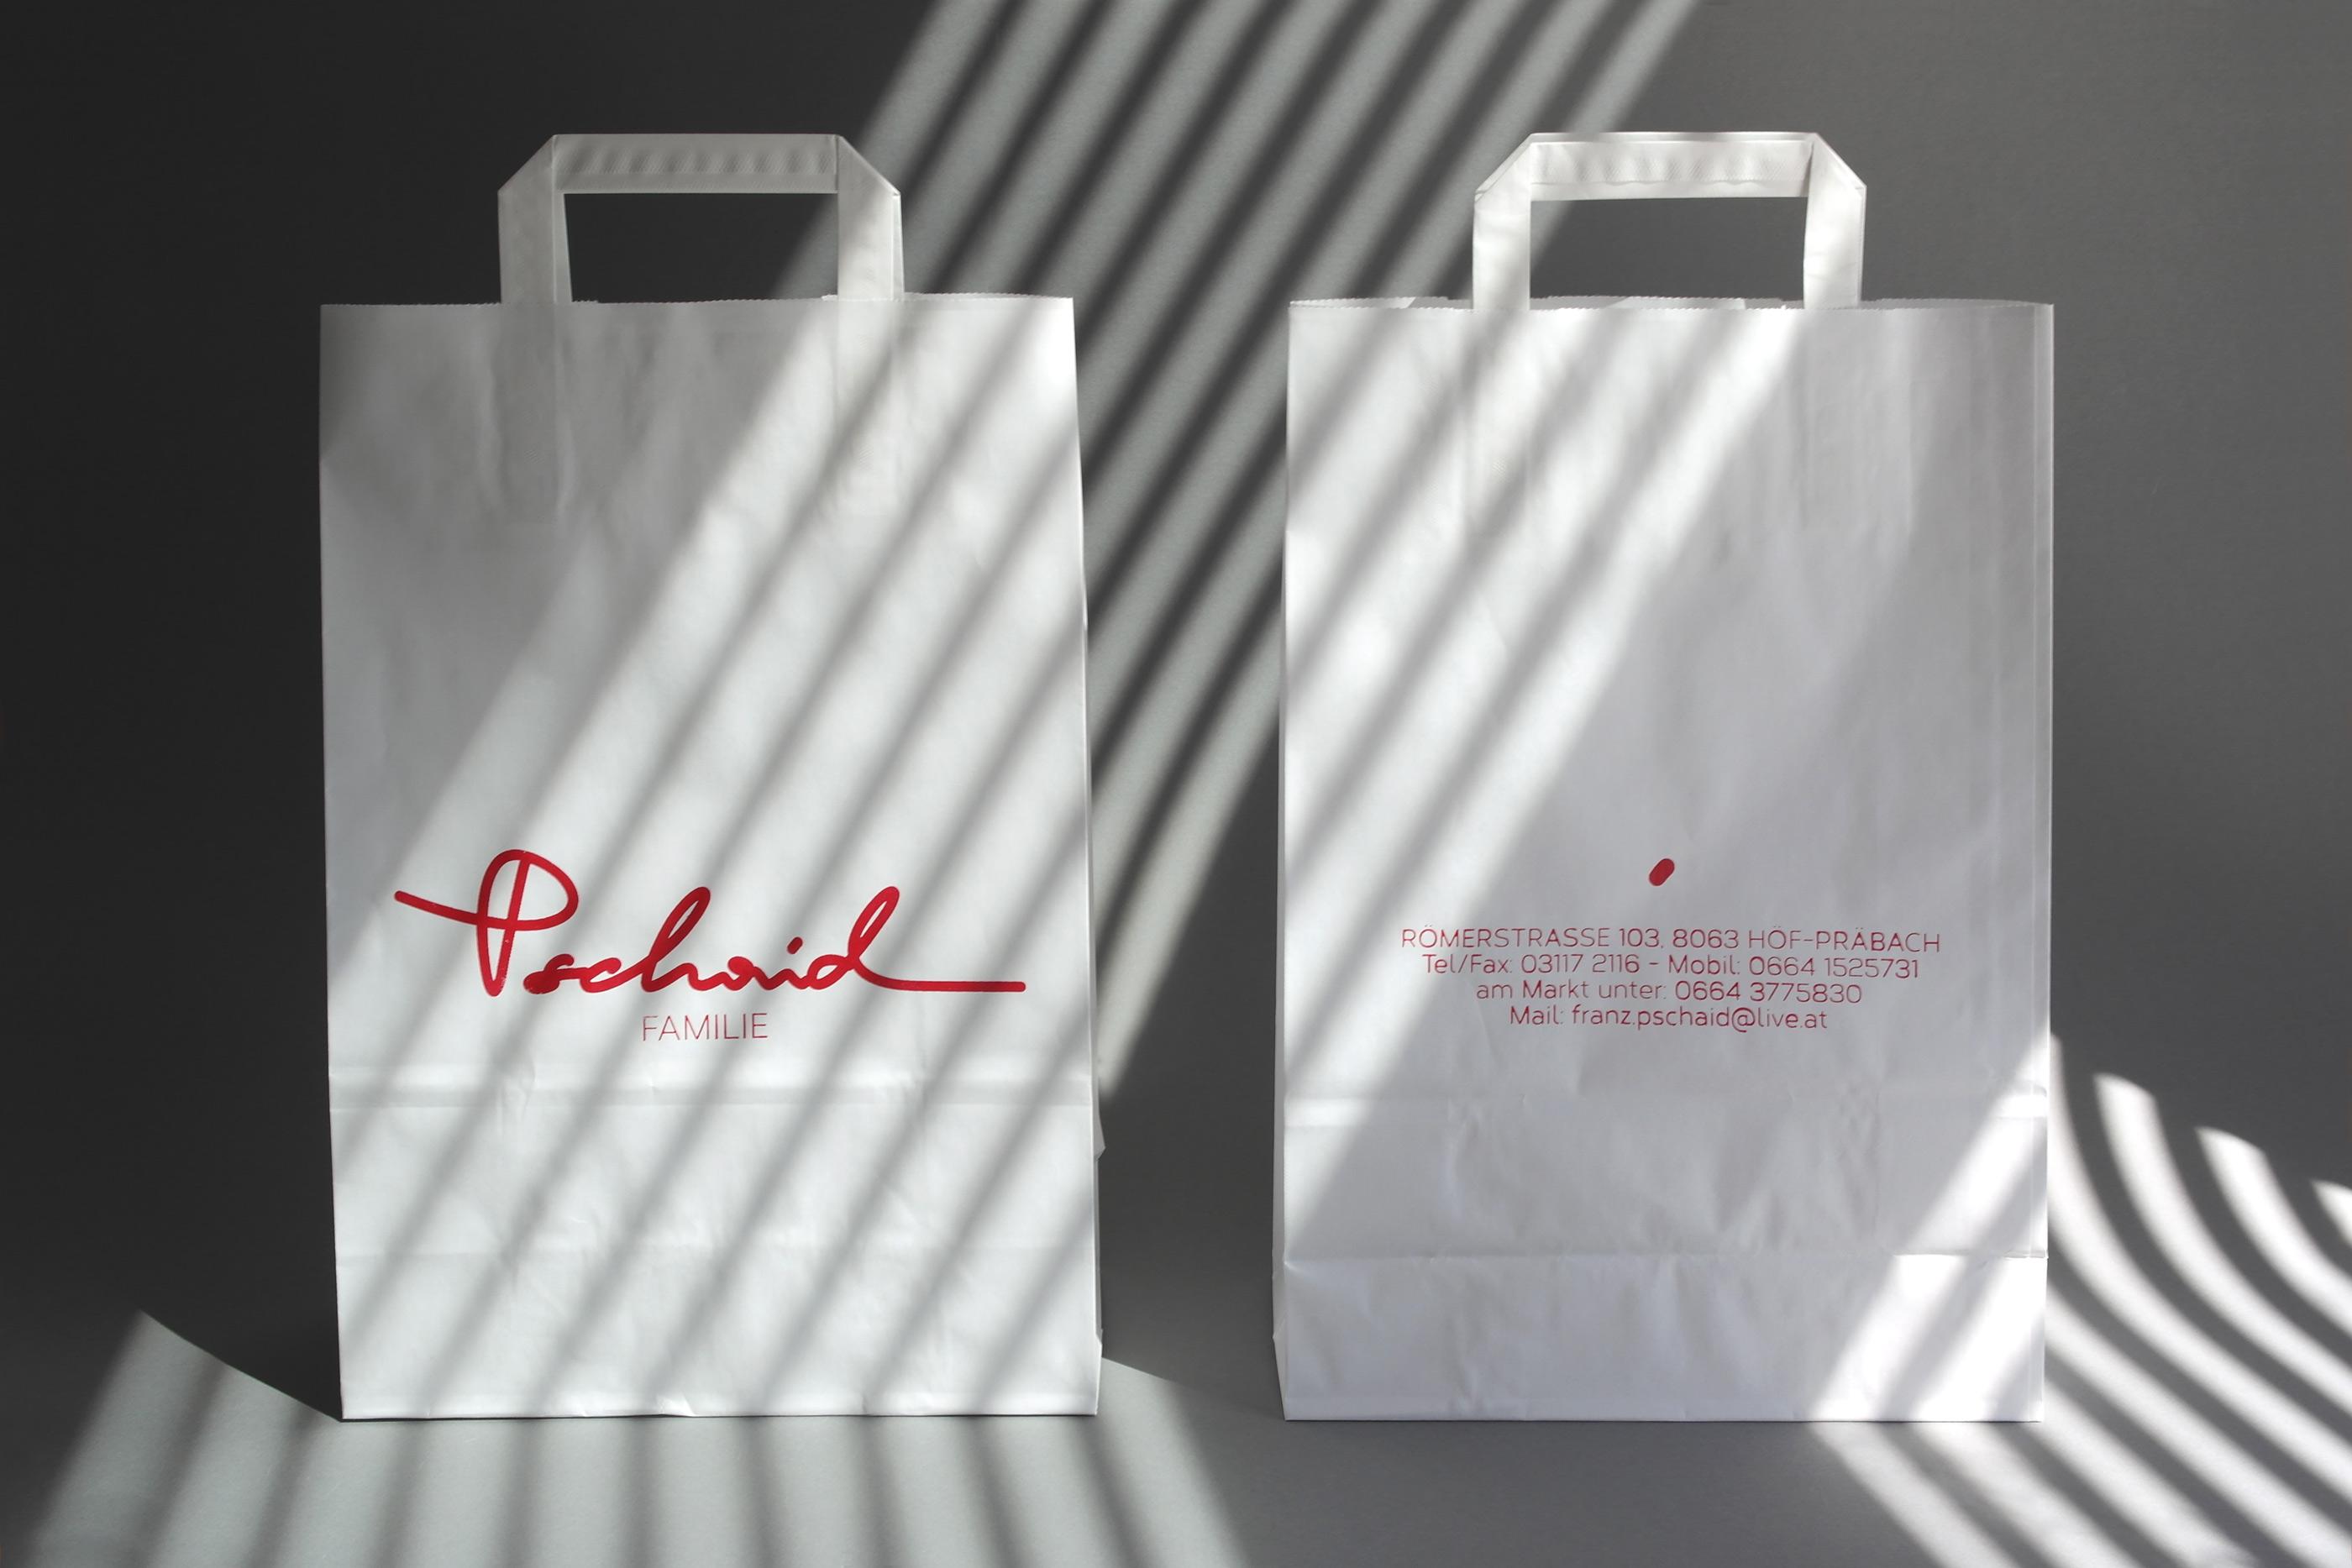 pschaid-01